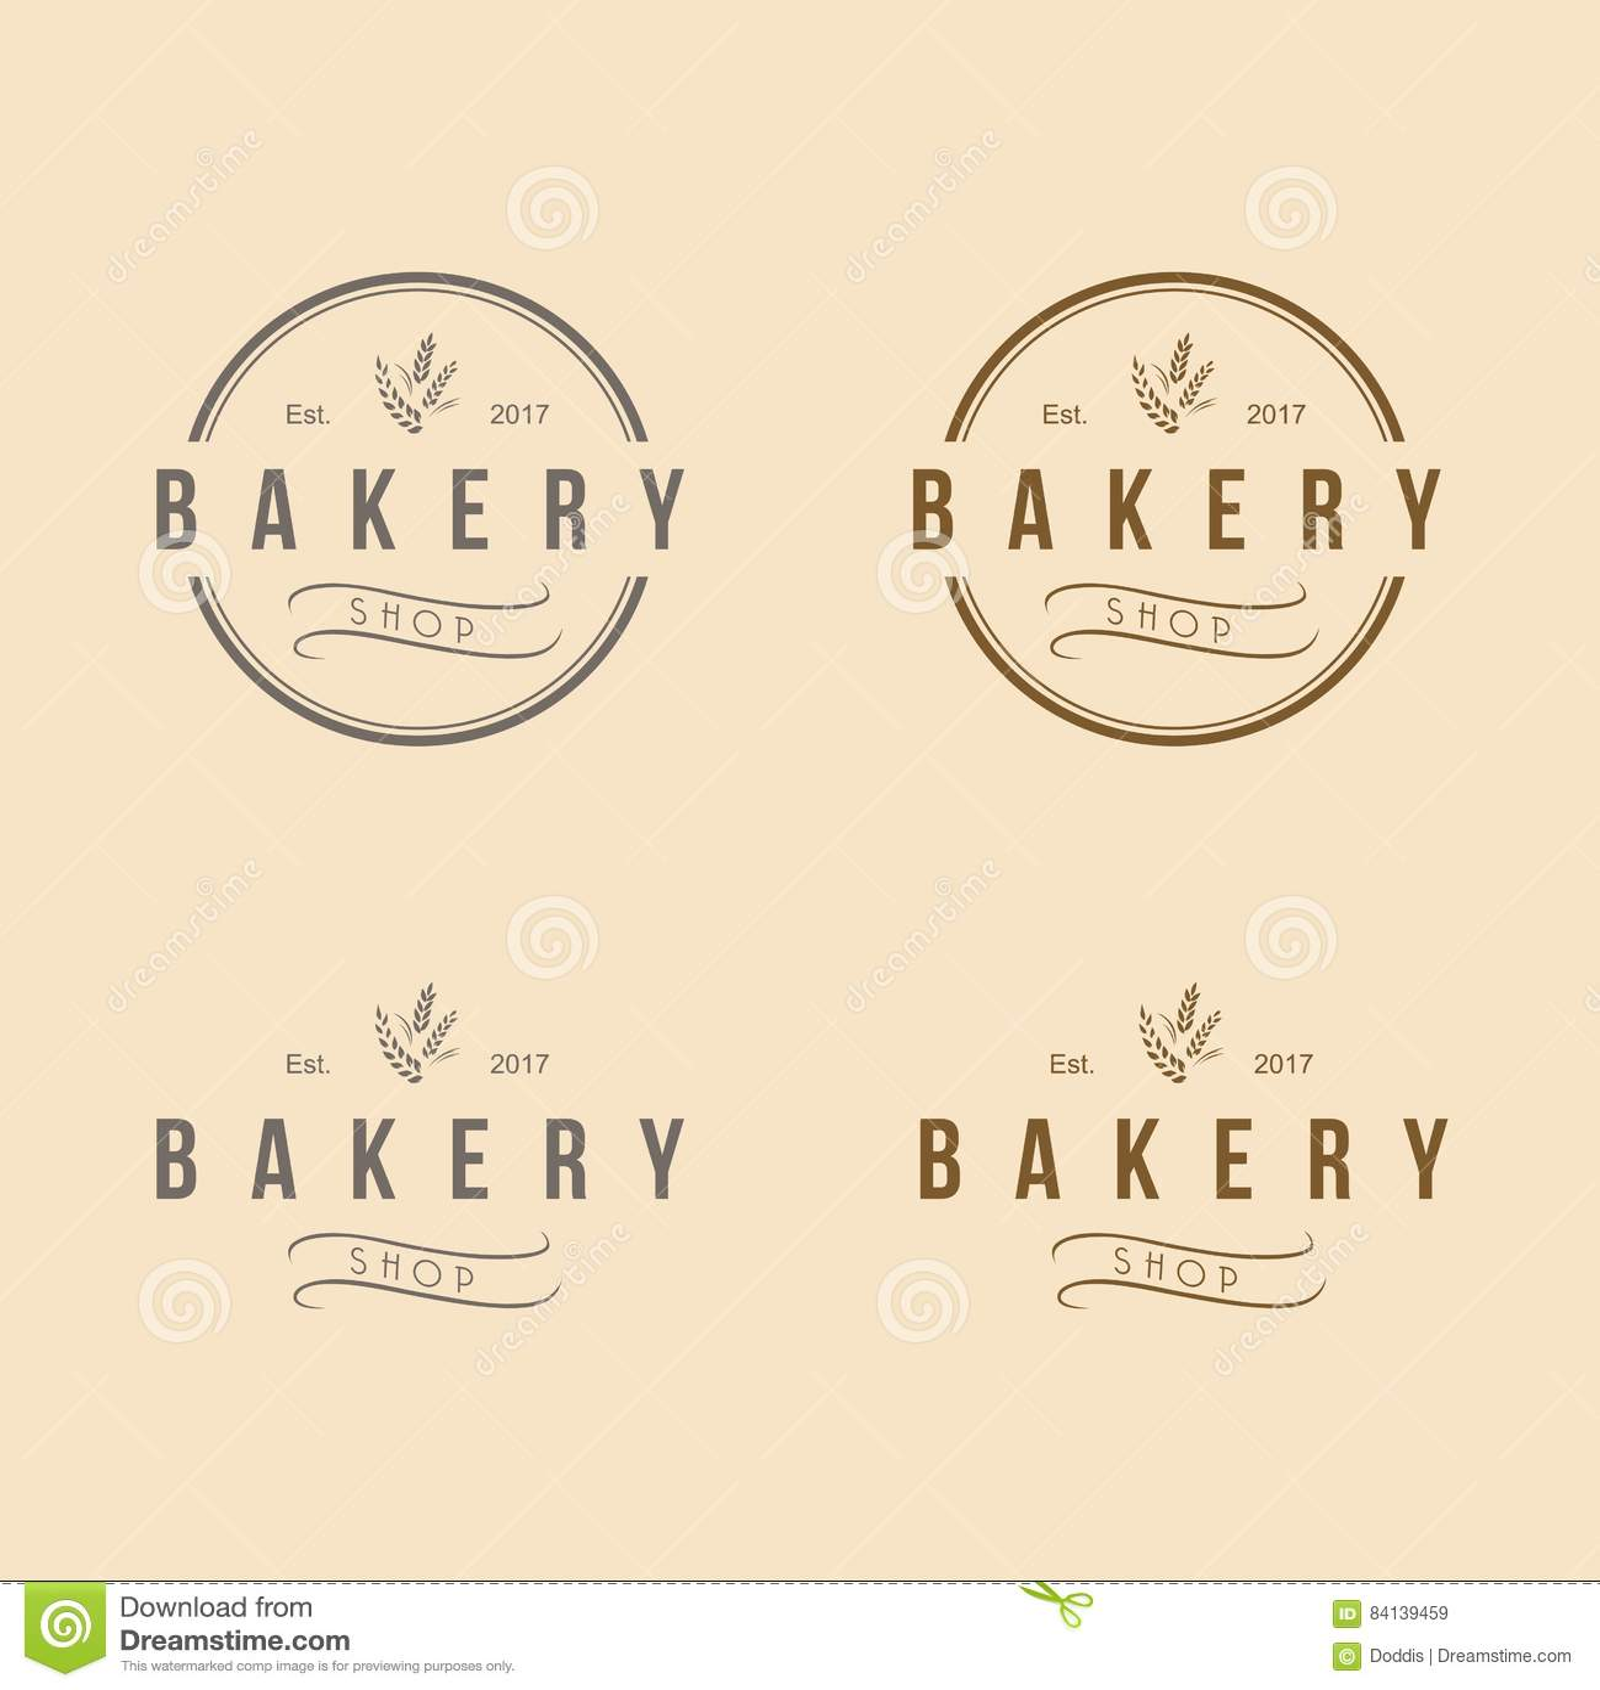 Bakery logo vintage retro design vector template stock vector bakery logo vintage retro design vector template royalty free vector pronofoot35fo Choice Image